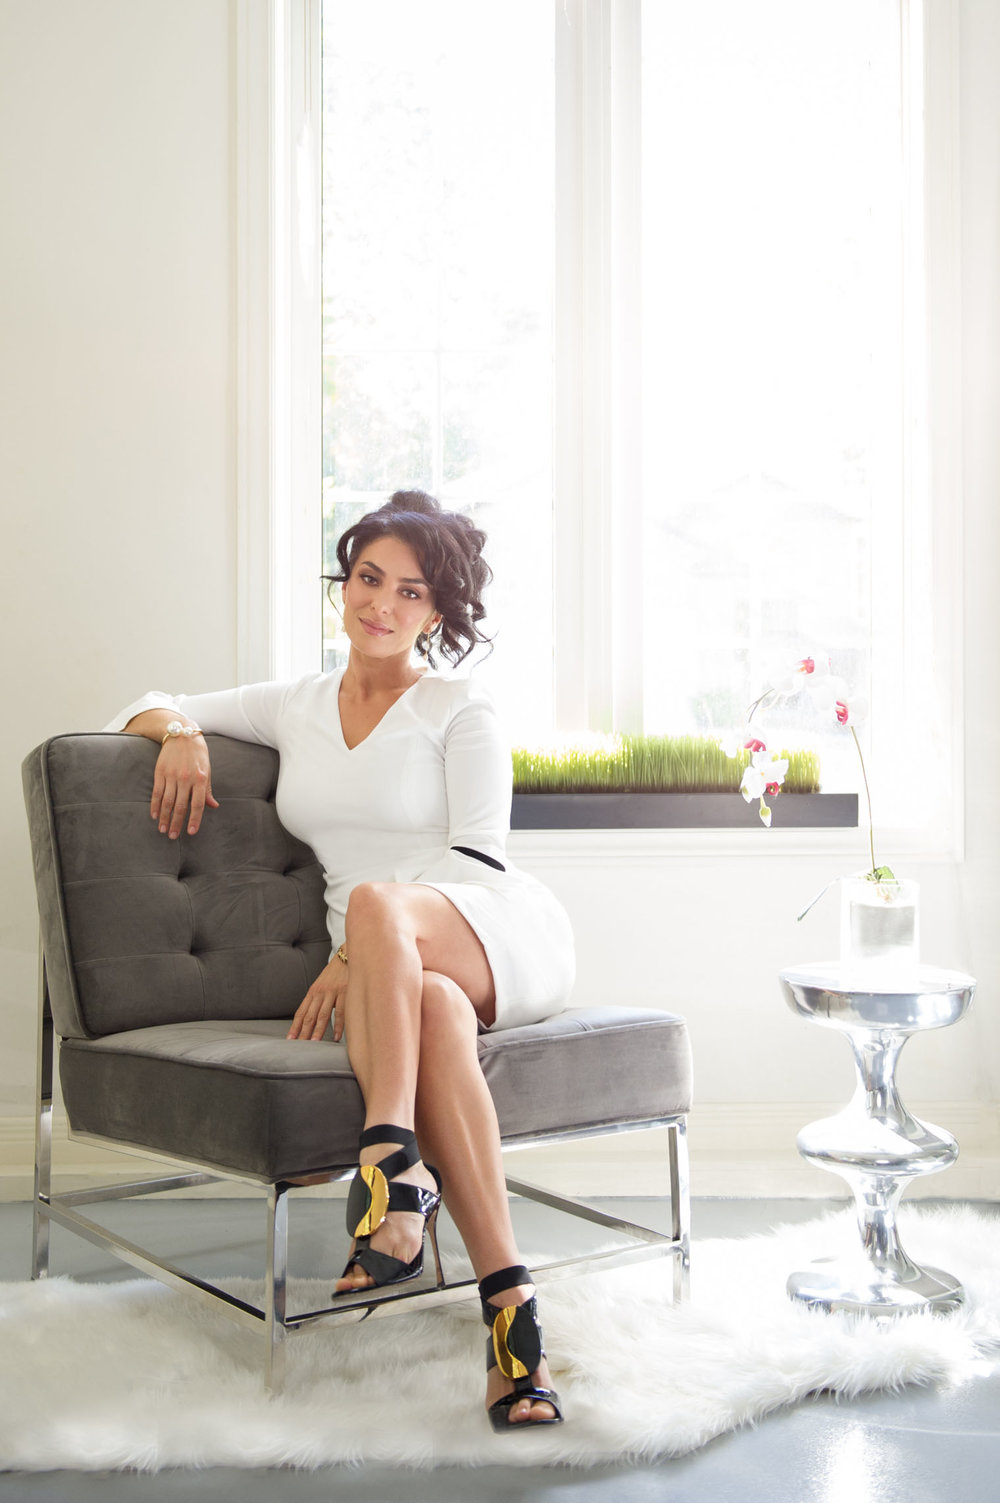 Personal Branding Photographer Windsor Ontario Heike Delmore